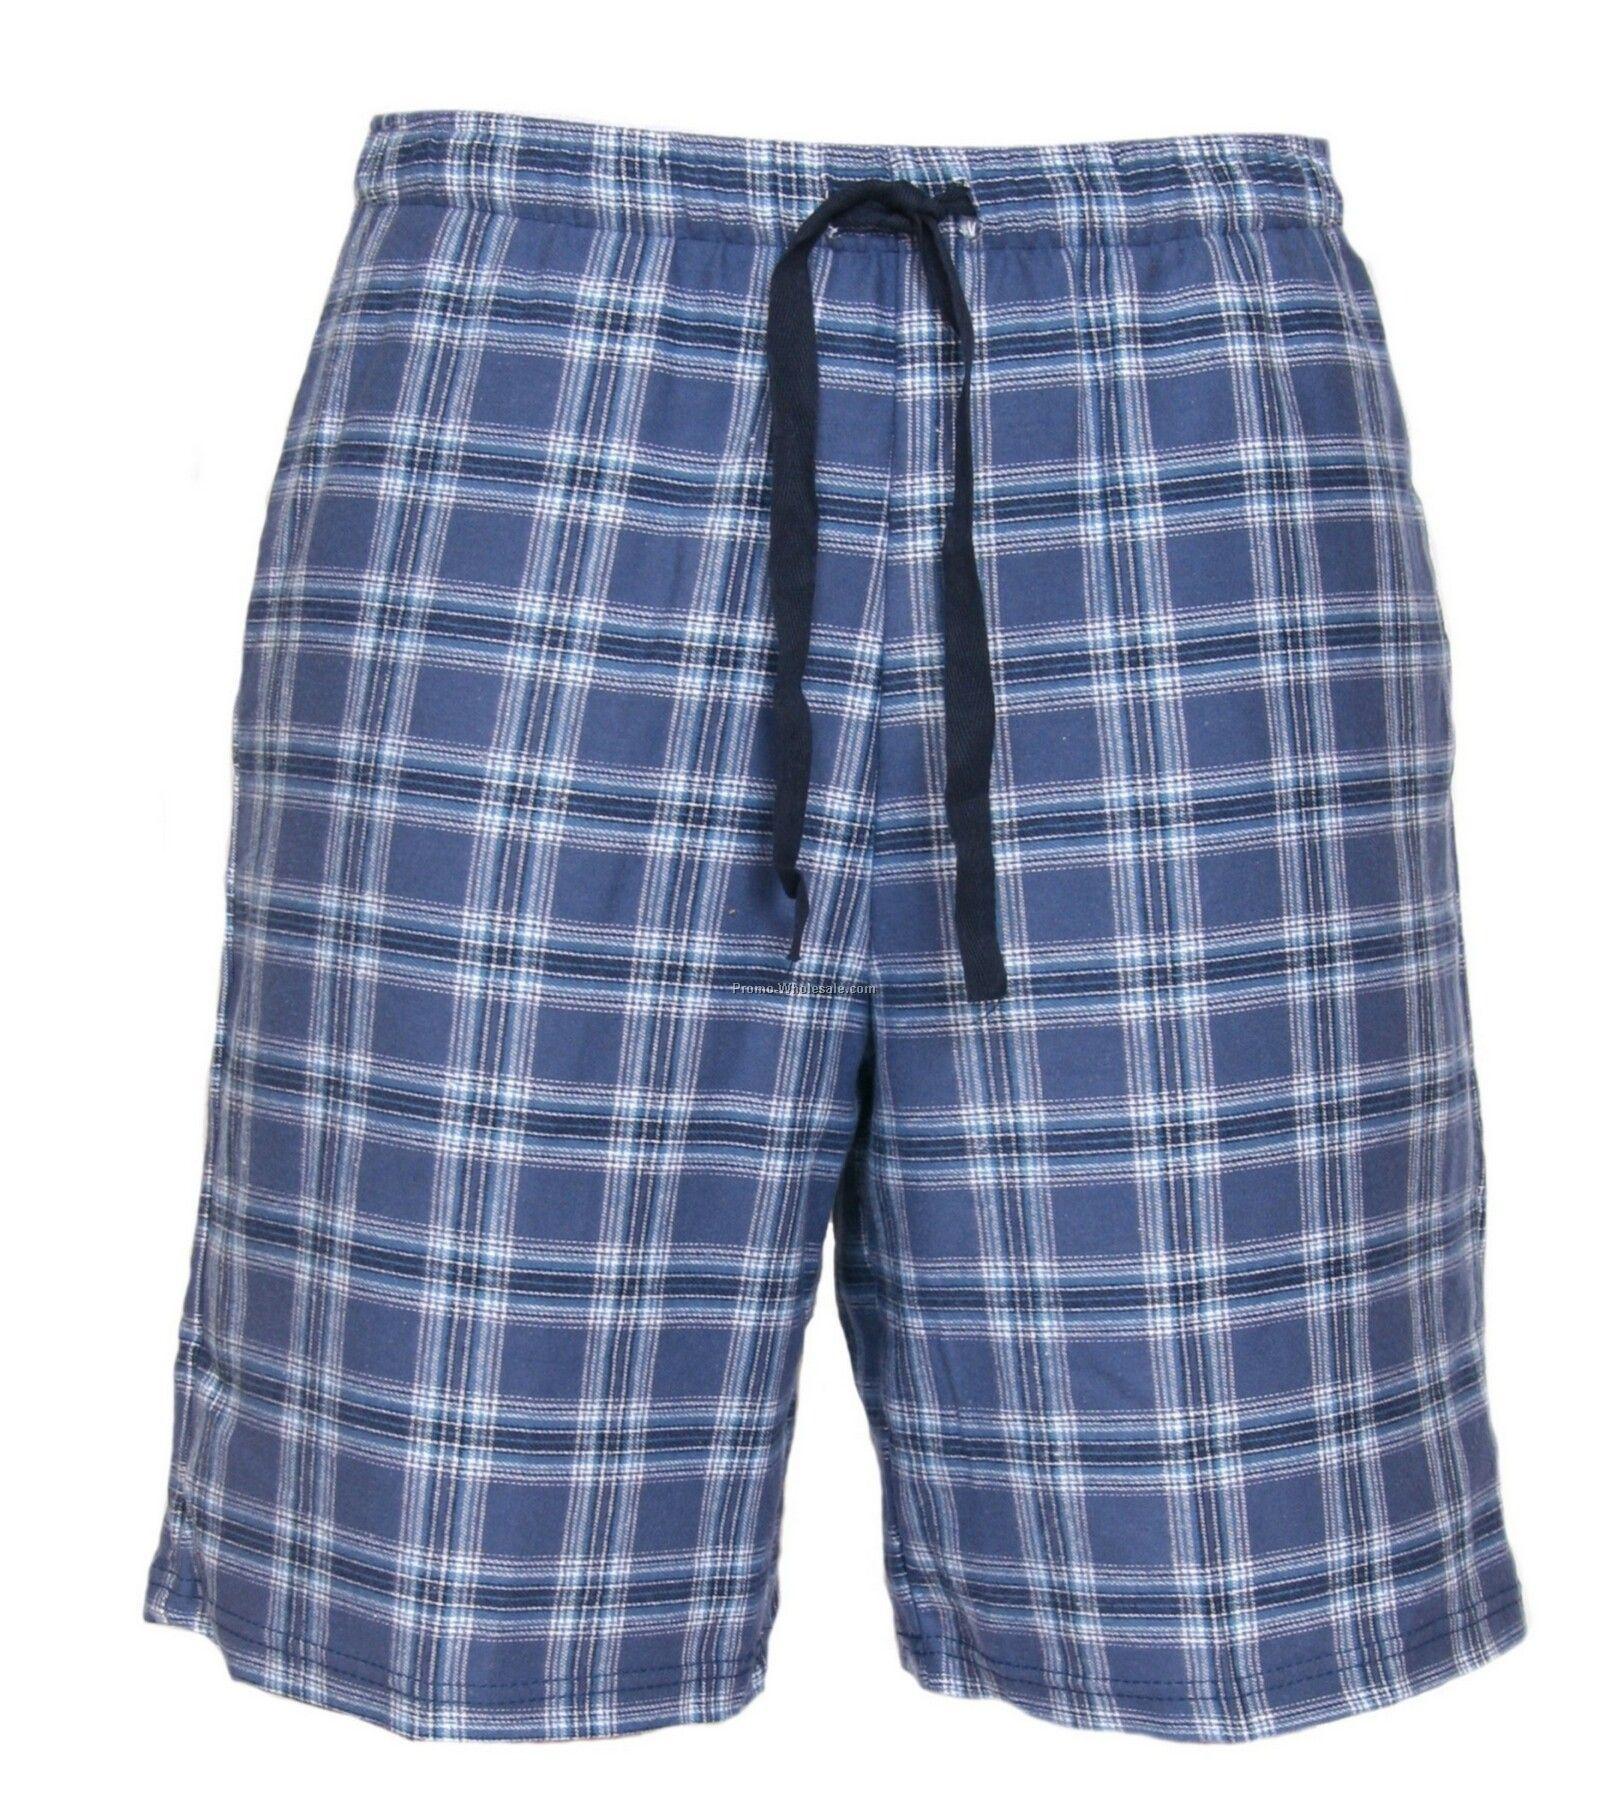 Adults' Royal Blue/ White Flannel Dorm Shorts (2xl)